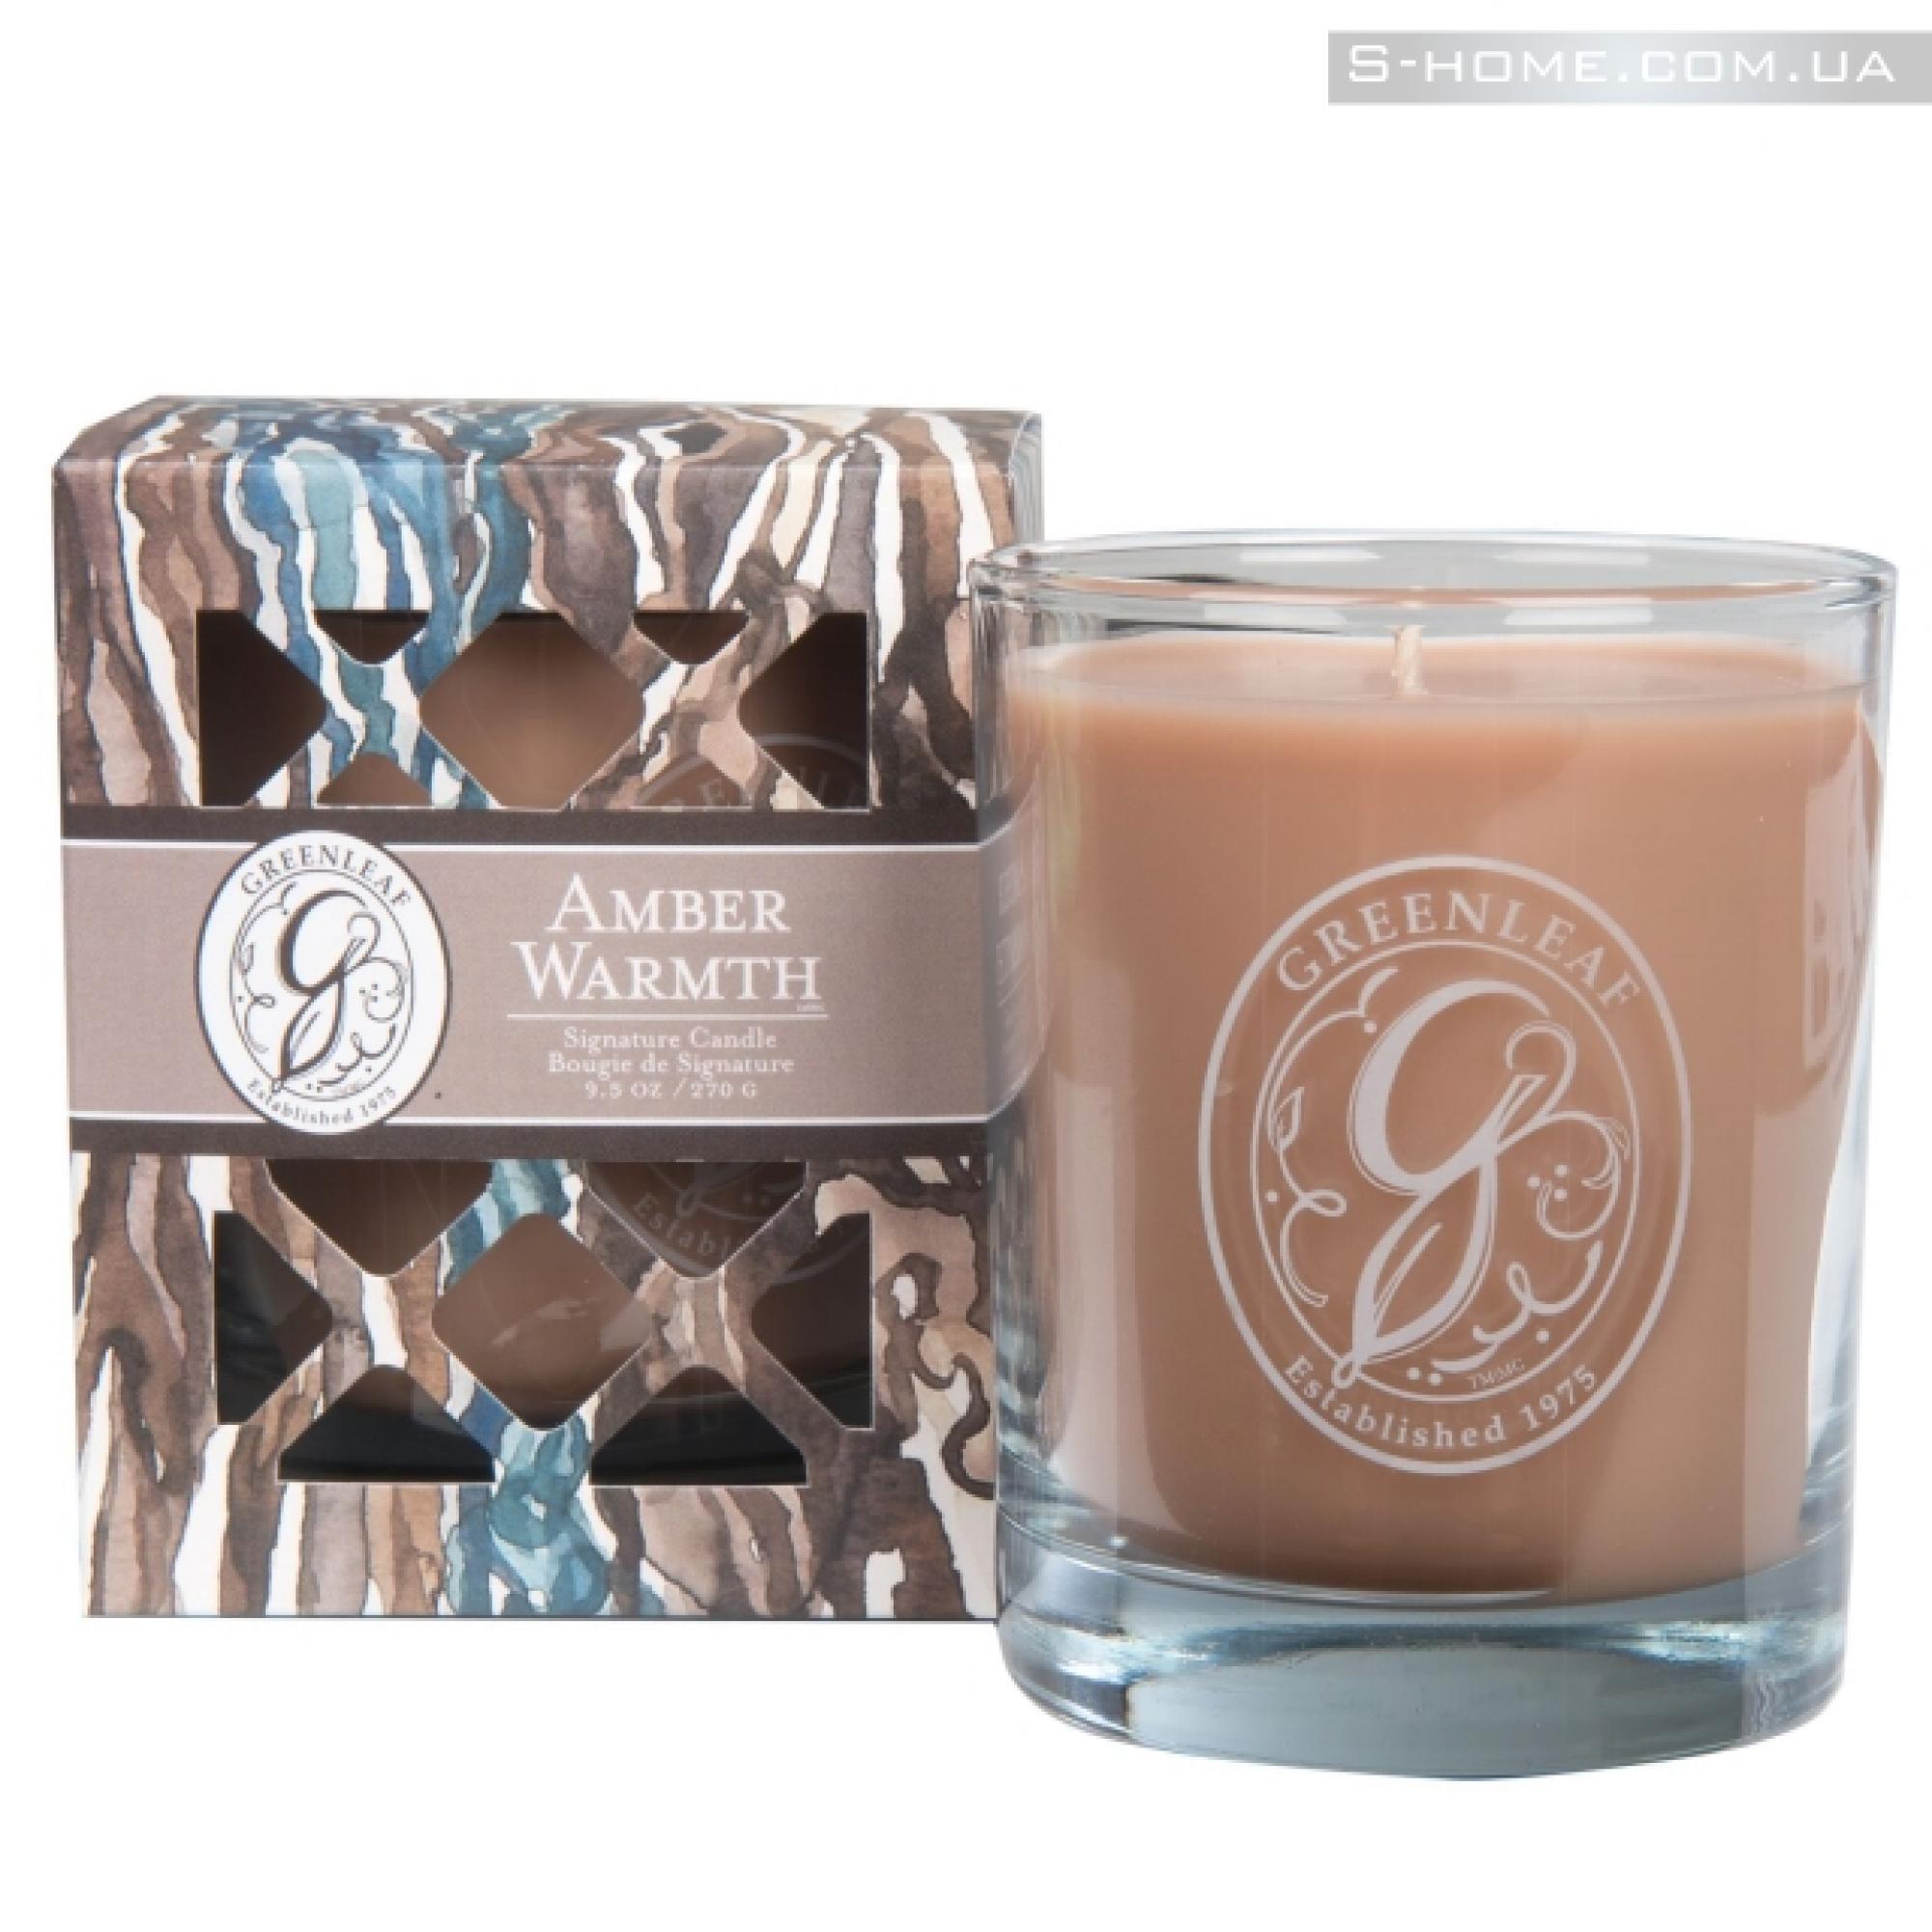 "Ароматическая свеча Greenleaf Тепло Янтаря ""Amber Warmth"""